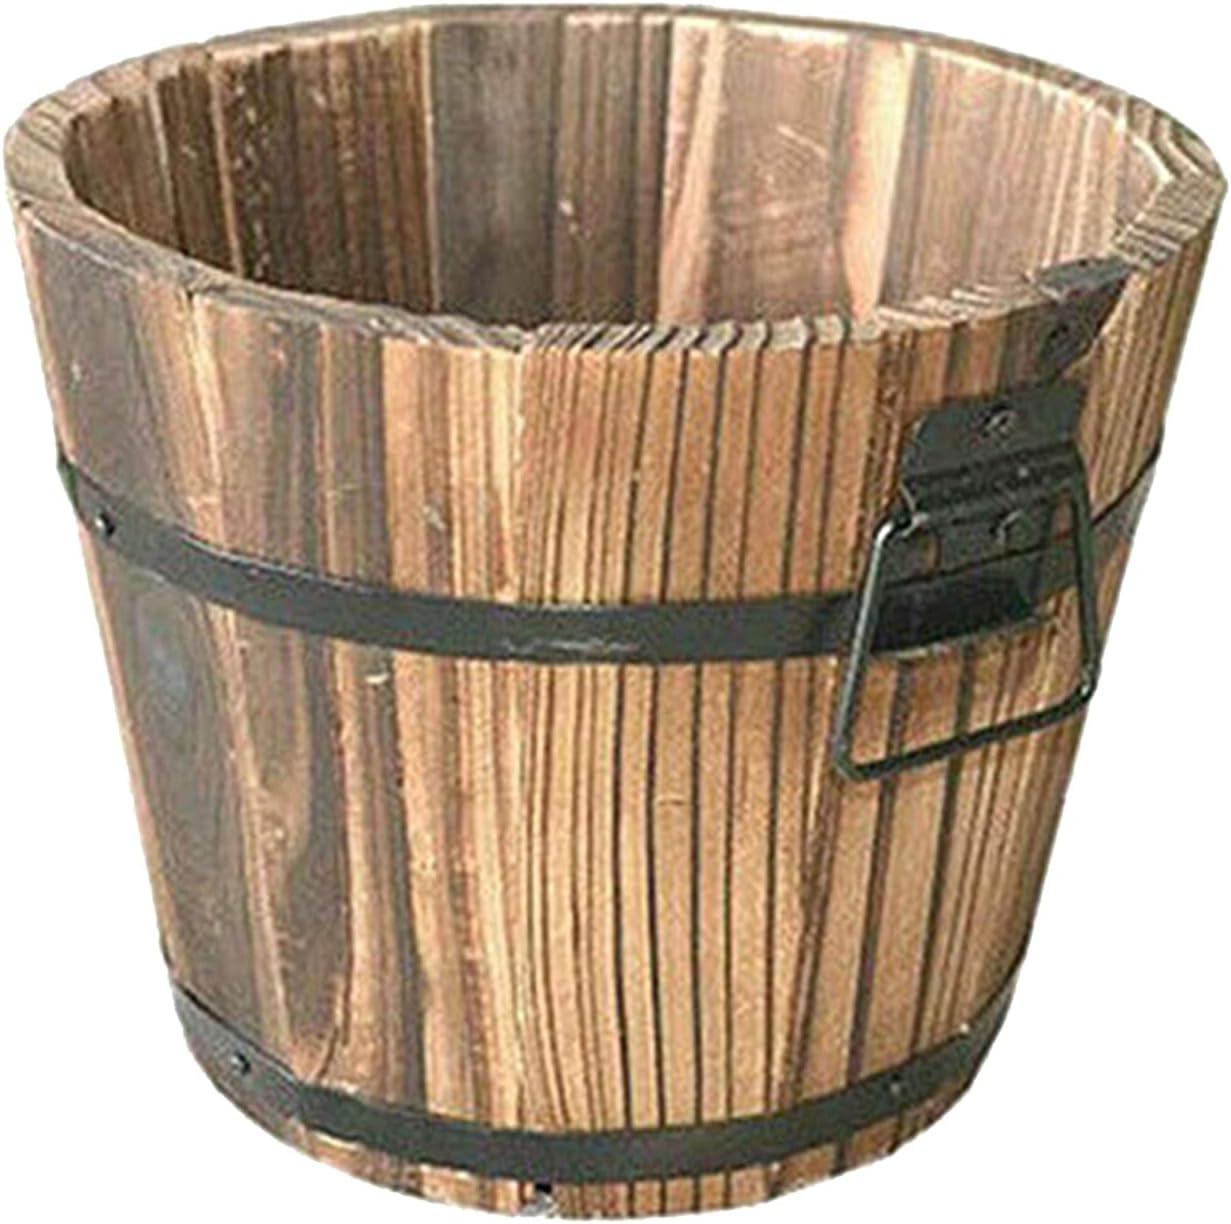 Cheap HANTURE Wooden Planter Barrel Set Rustic with famous of Handle 3